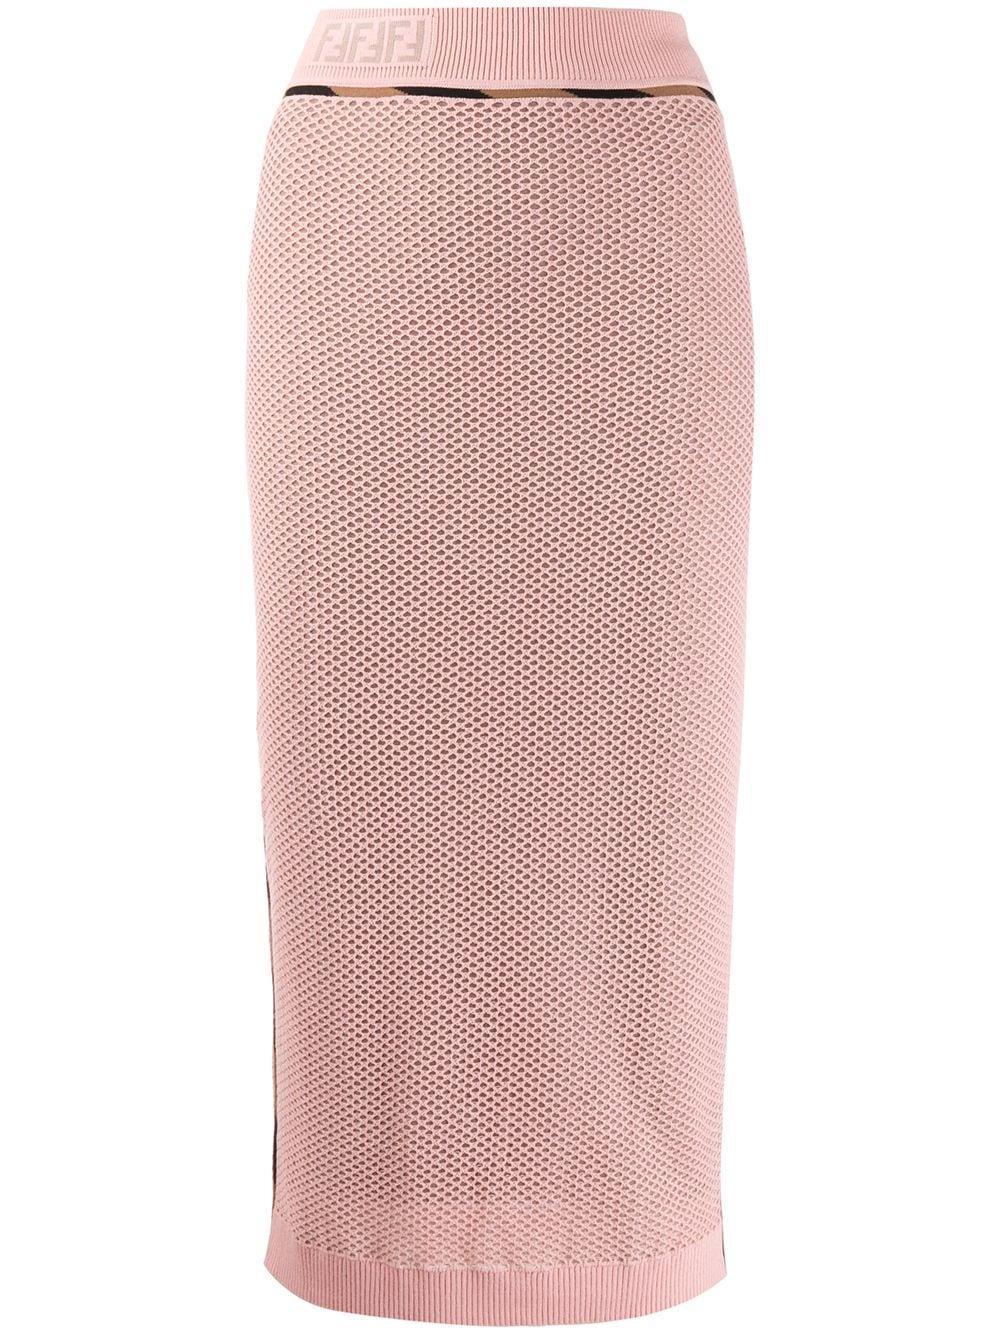 Fendi FF mesh pencil skirt